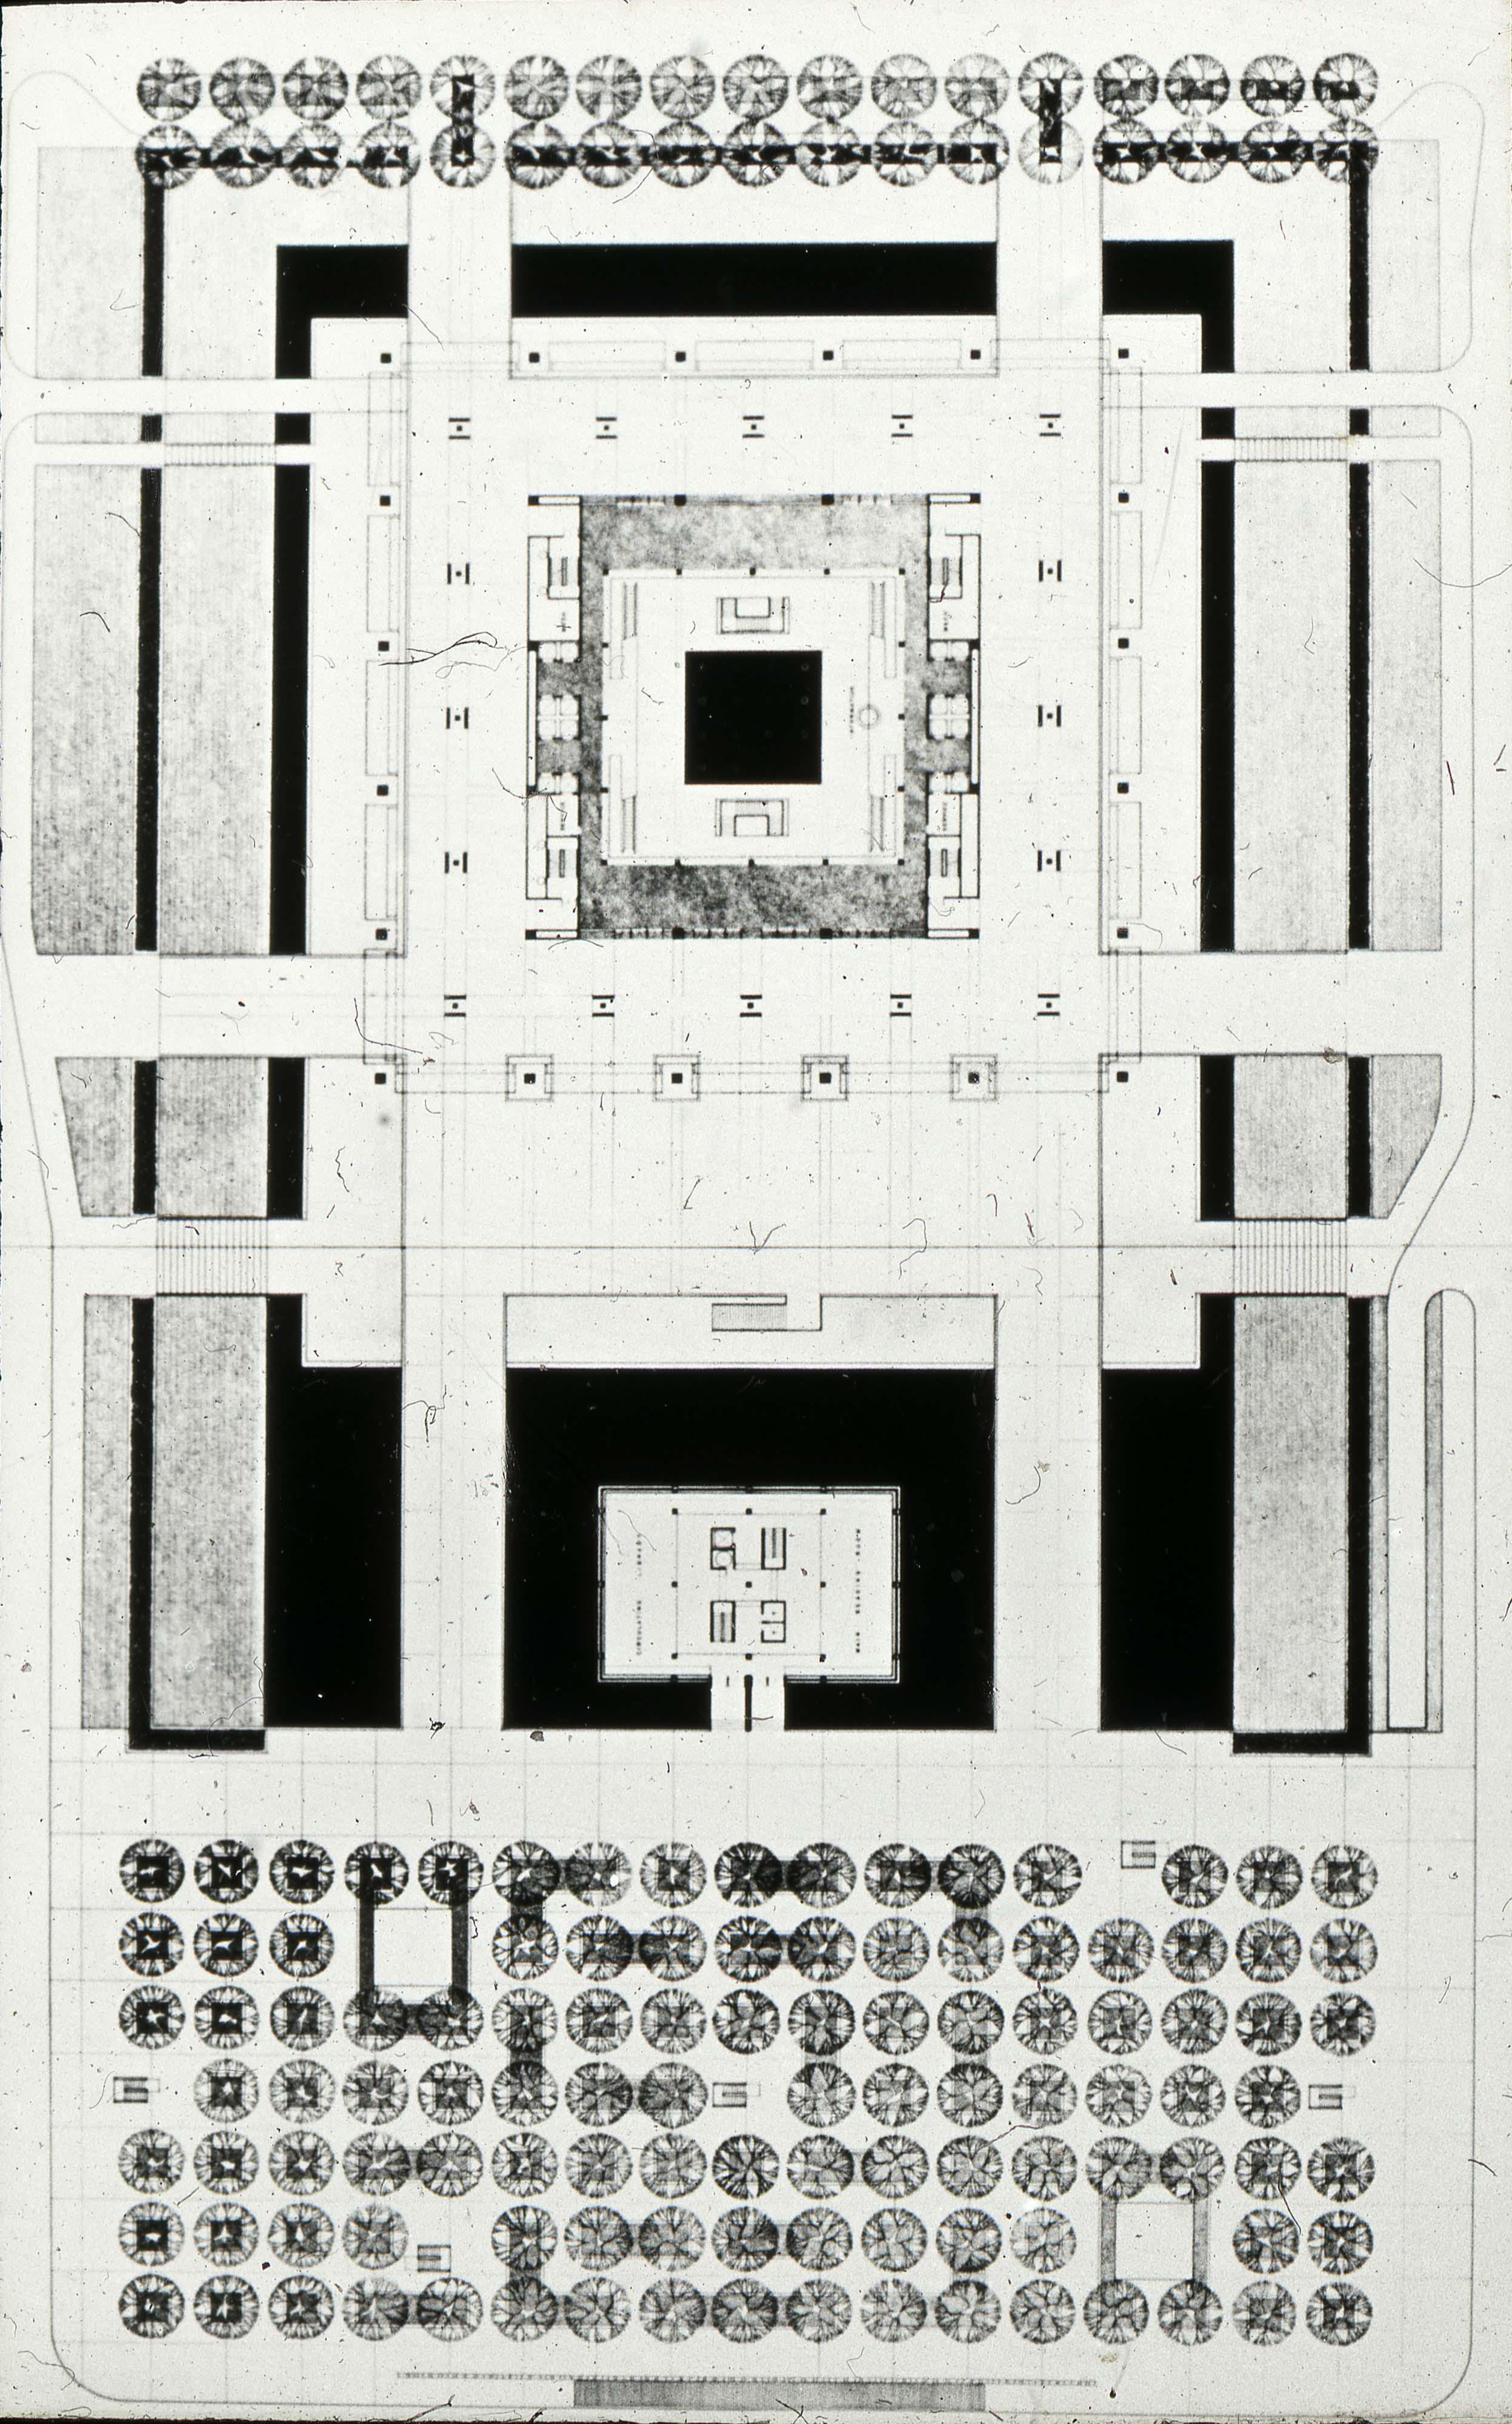 Frank Mikutowski Entry City Hall And Square Competition Toronto 1958 Floor Plan 183 Tpl Virtual